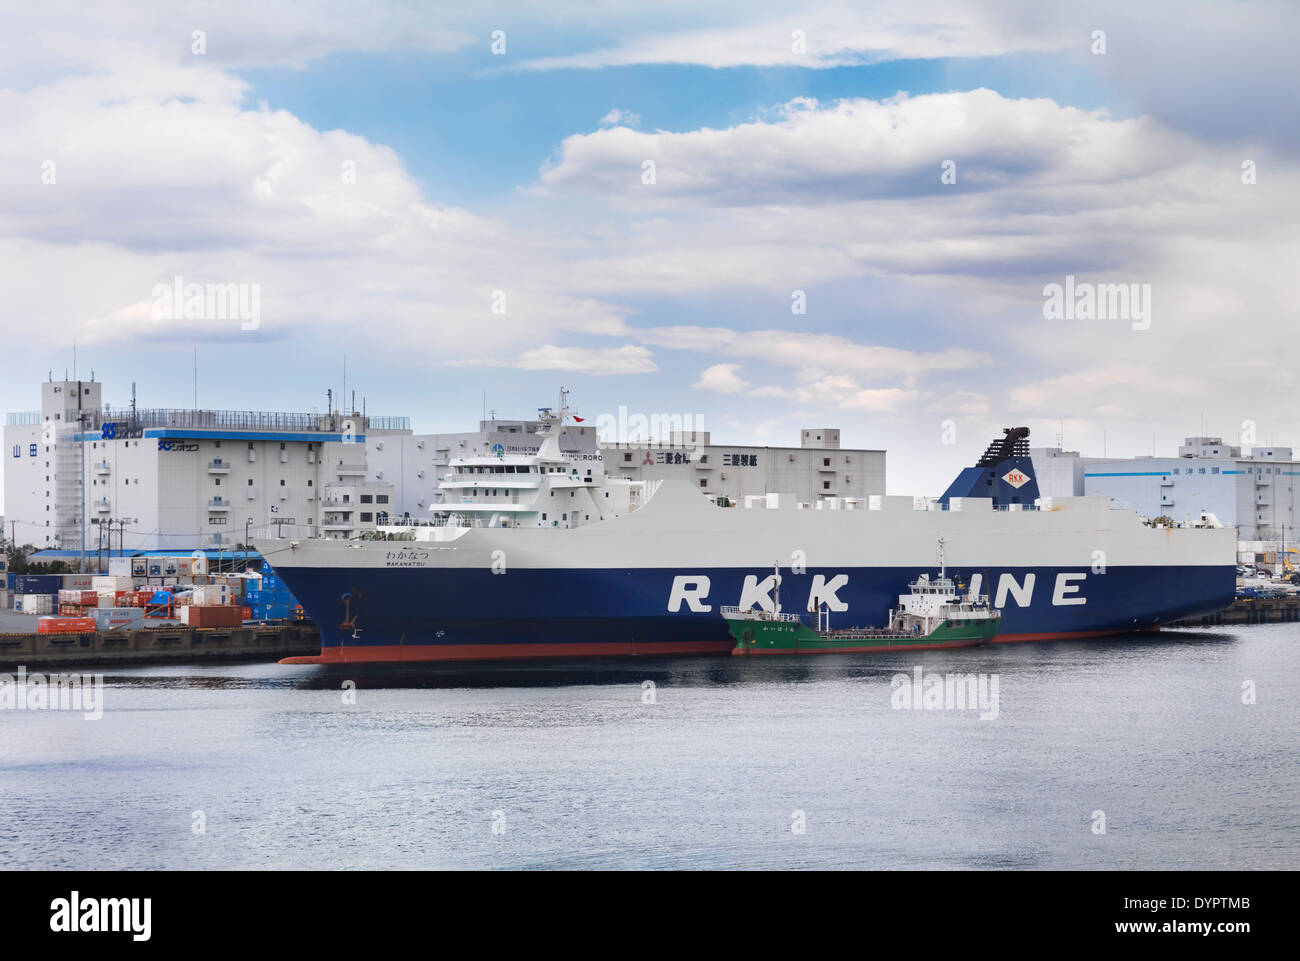 Wakanatsu cargo ship Ro-Ro RKK line in a port at Odaiba, Tokyo, Japan. - Stock Image